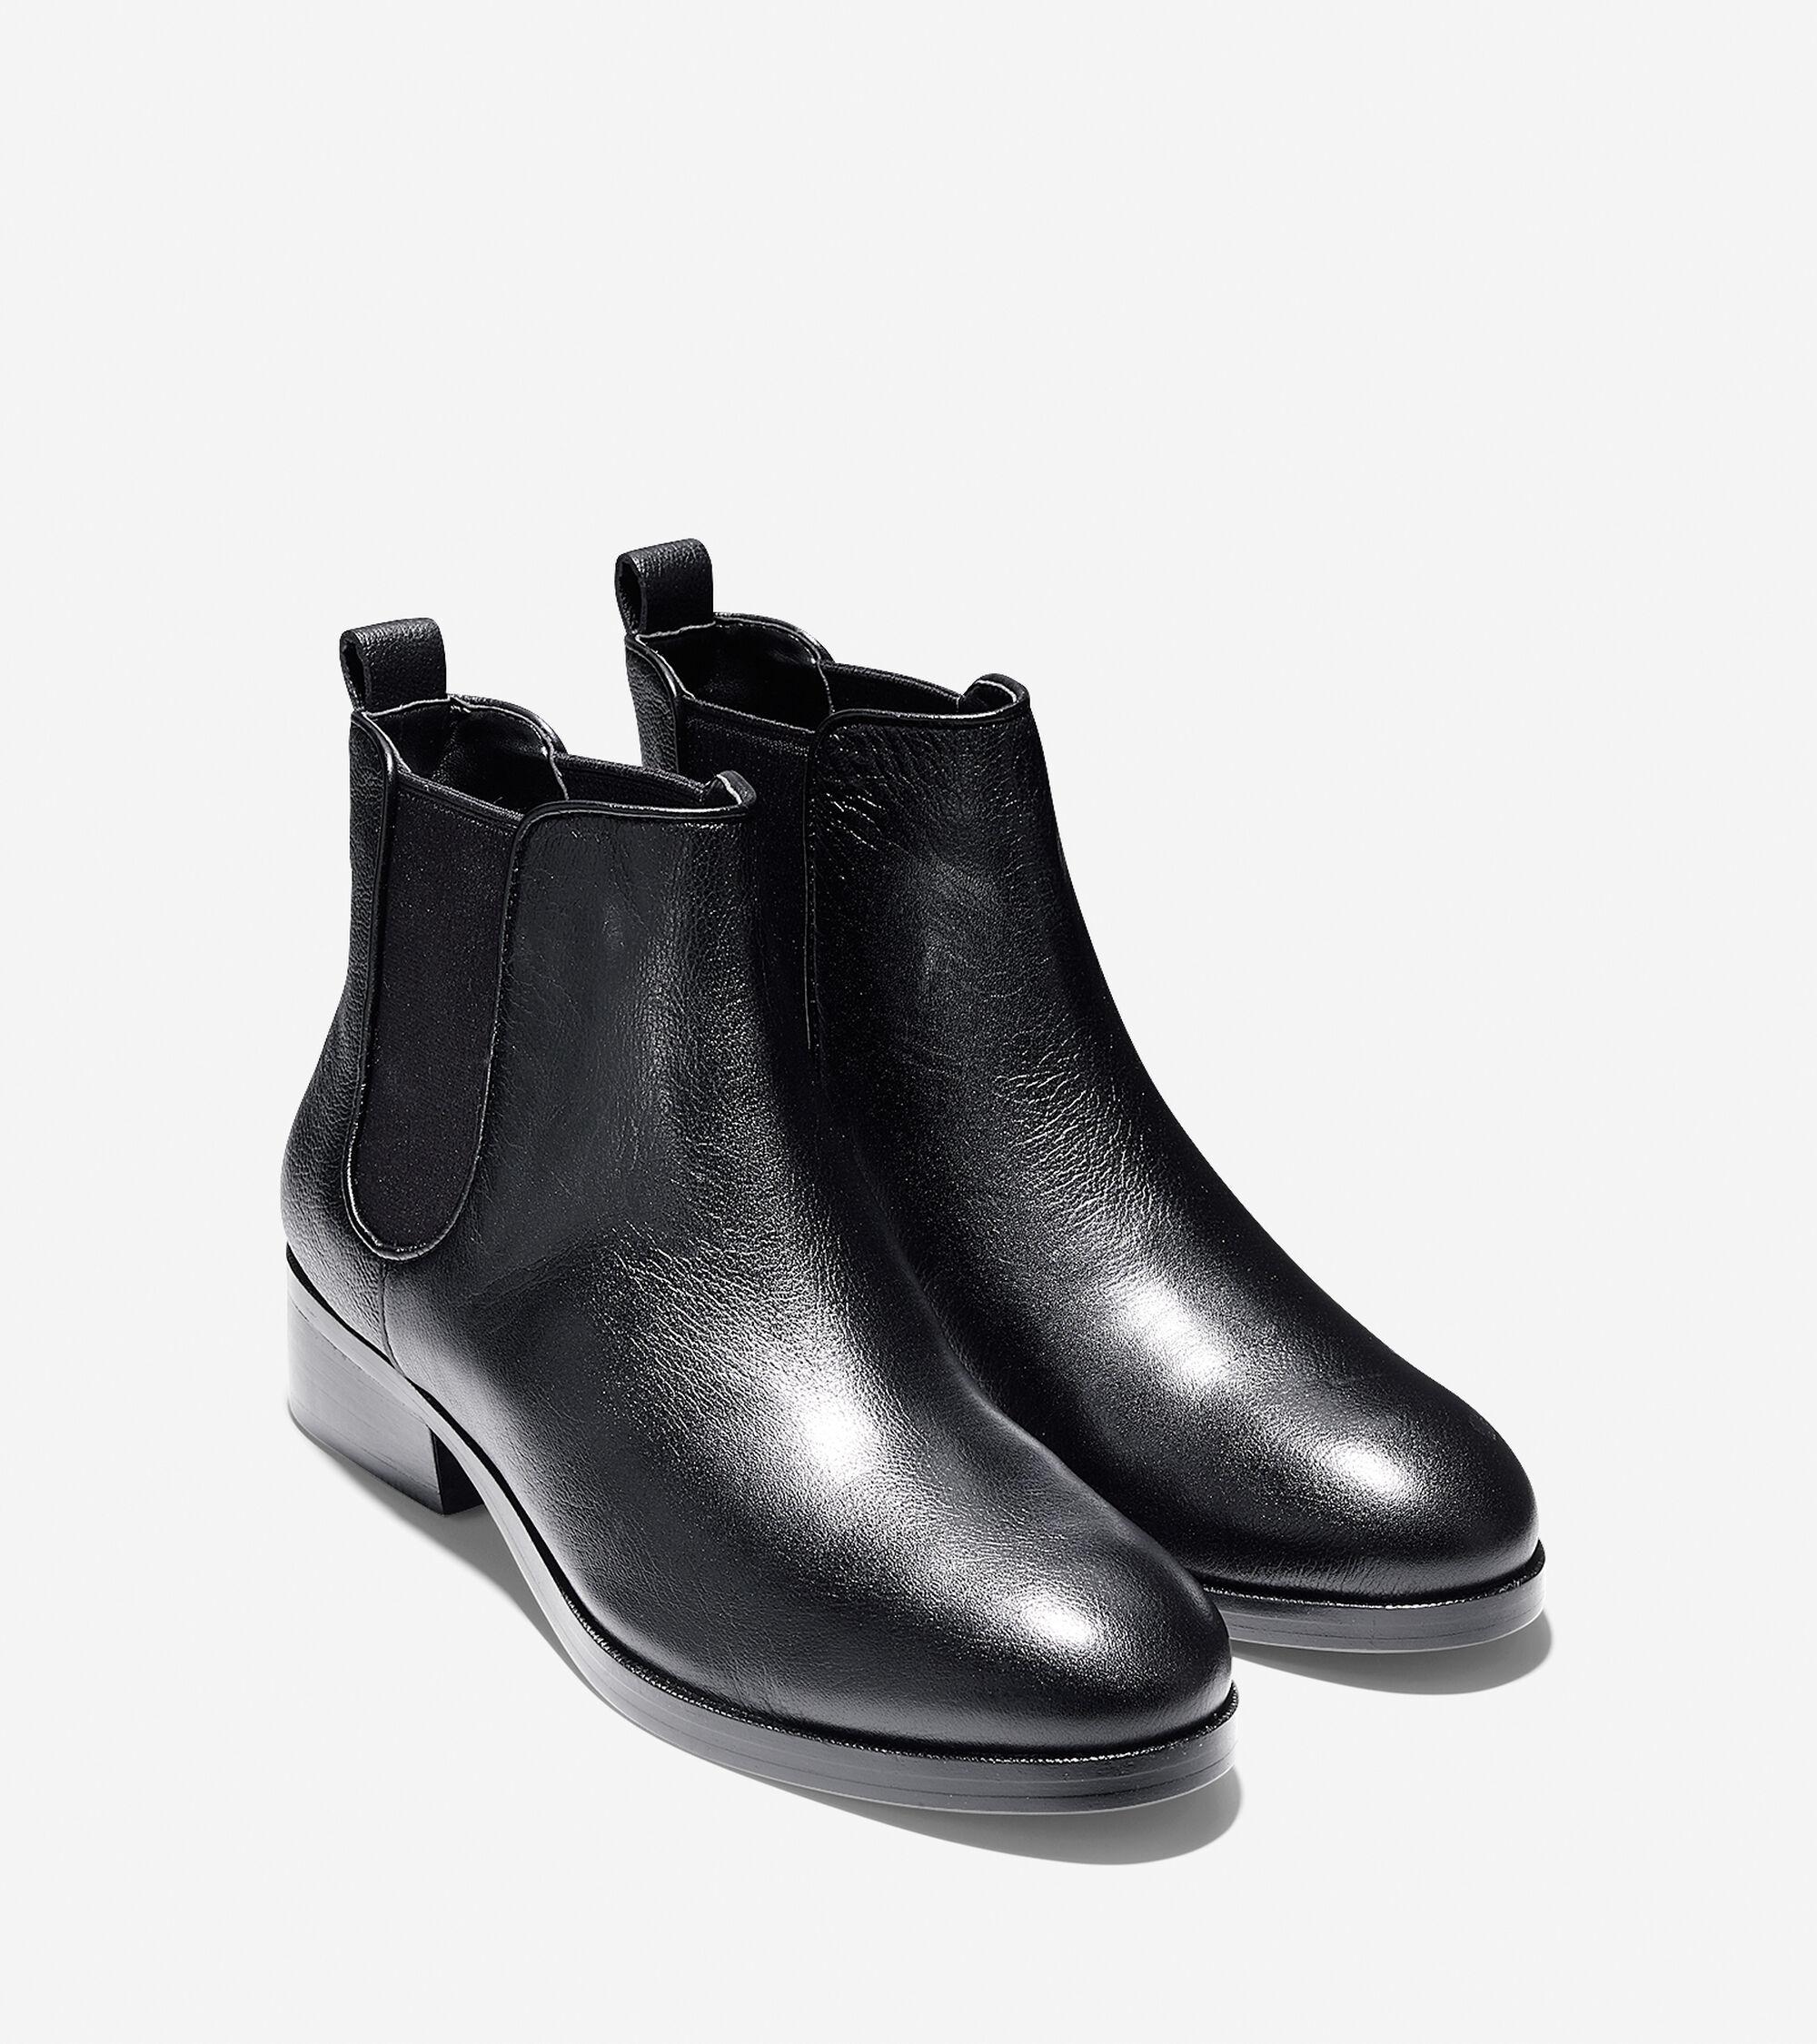 Cole haan black leather gloves -  Colehaan